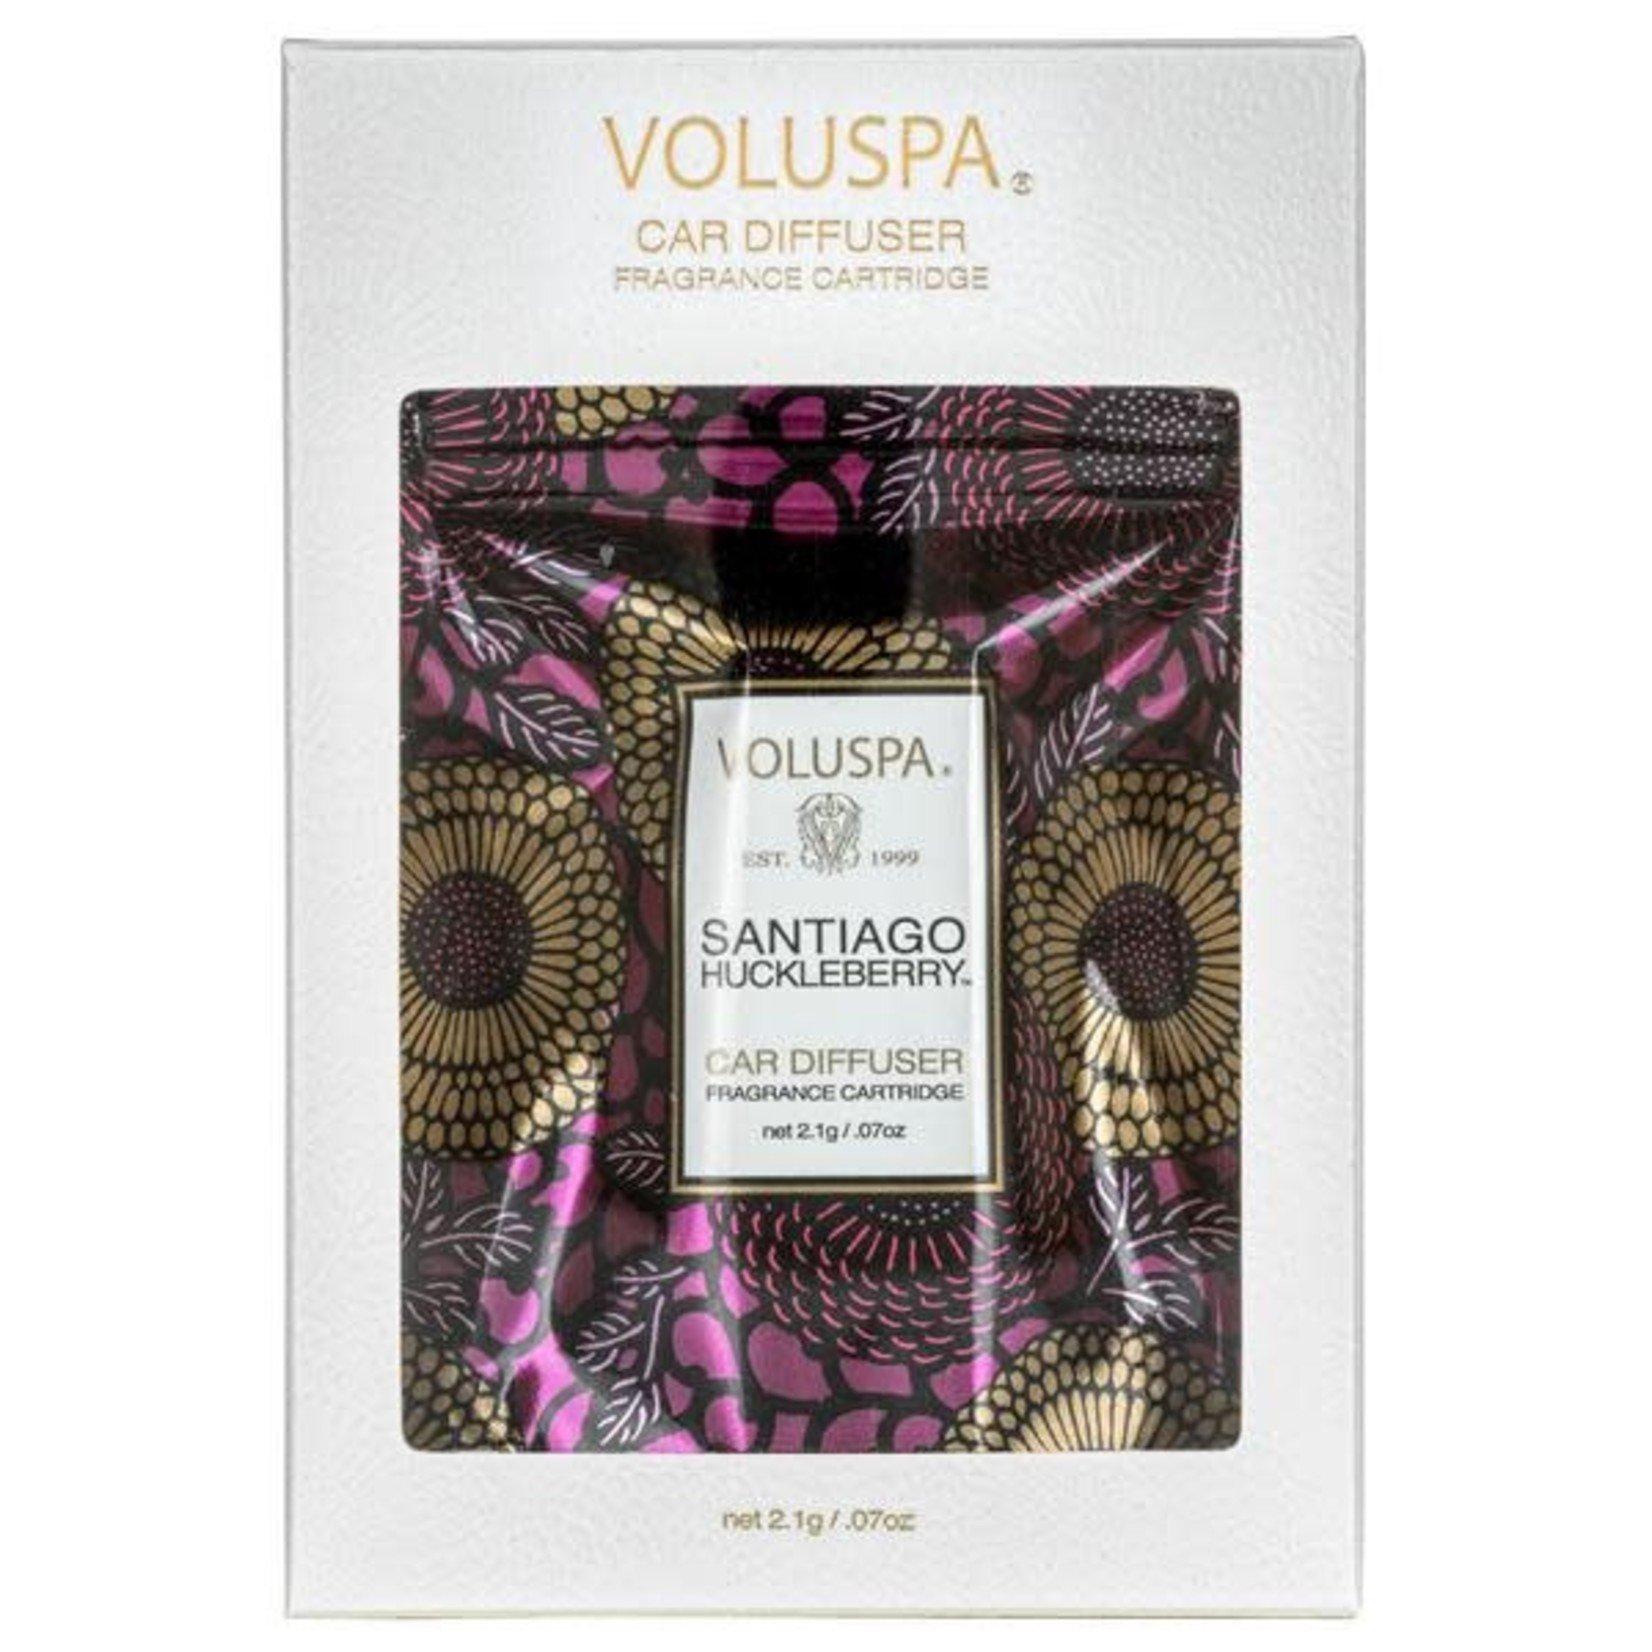 Voluspa Santiago Huckleberry Fragrance Cartridge Refill pouch